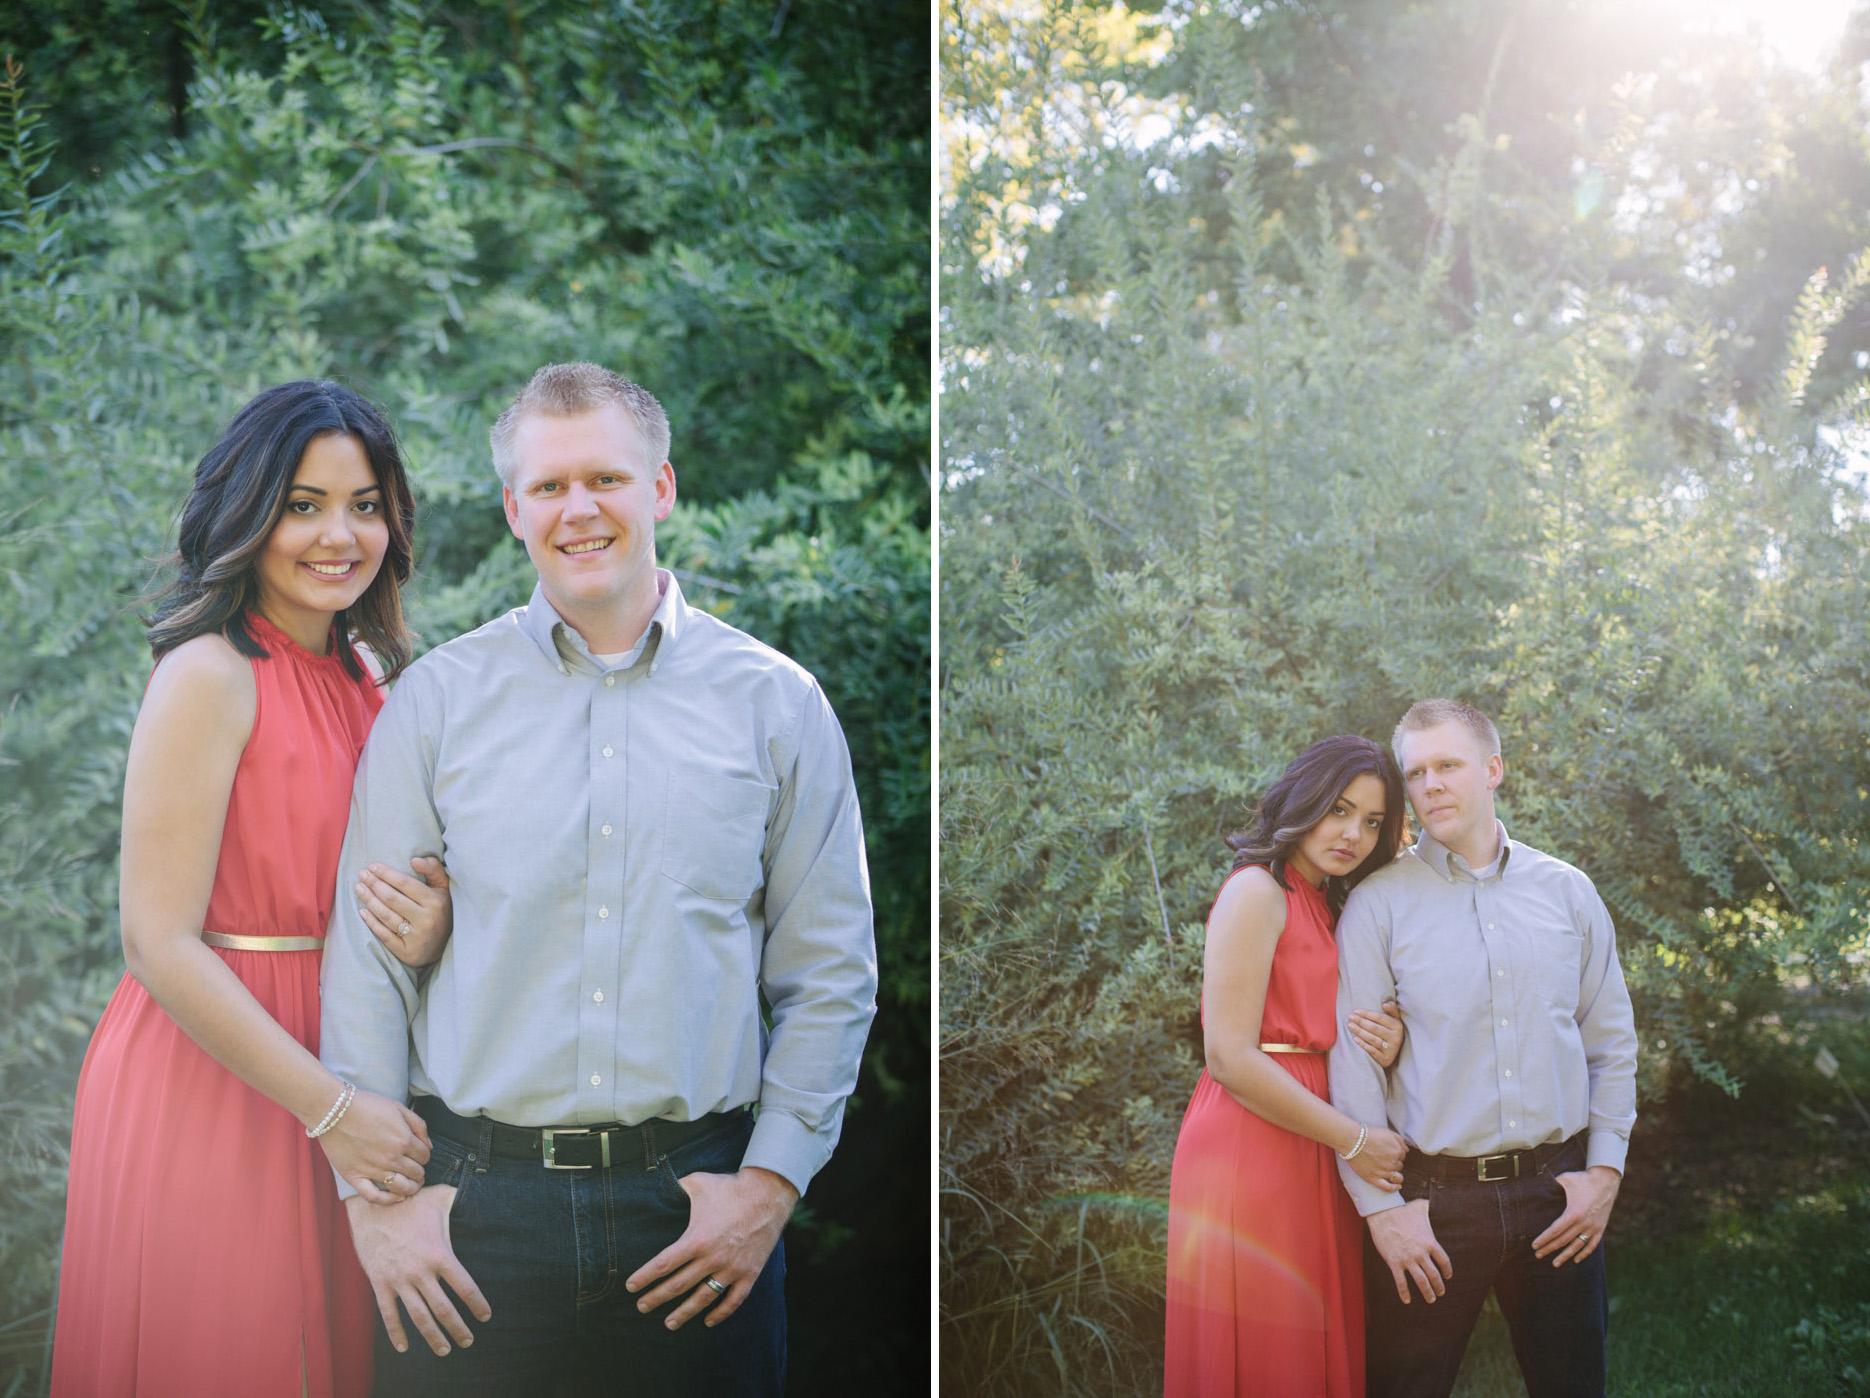 St-Louis-Wedding-Photography-1005-copy.jpg